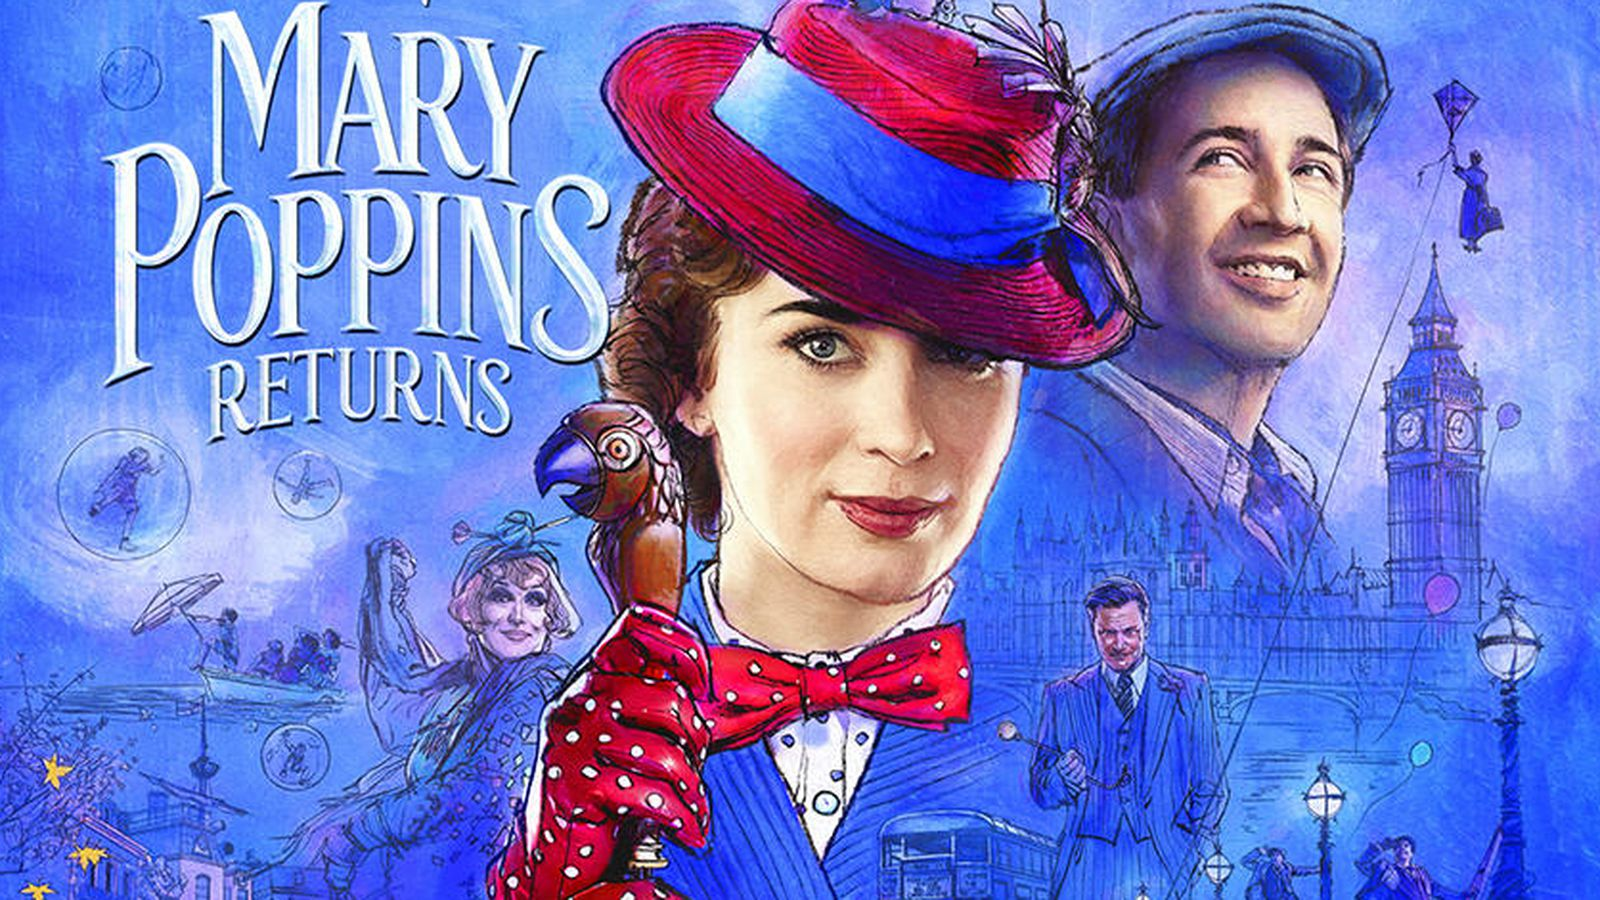 mary-poppins-returns-poster-emily-blunt.jpg